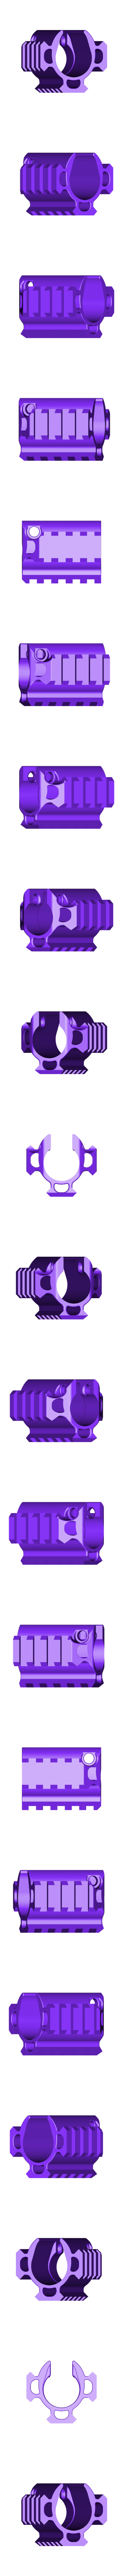 MP5K_P_RAIL_FORE_GRIP_v3.stl Download free STL file M1-MWS (Modular Weapon System) • 3D printing model, MuSSy